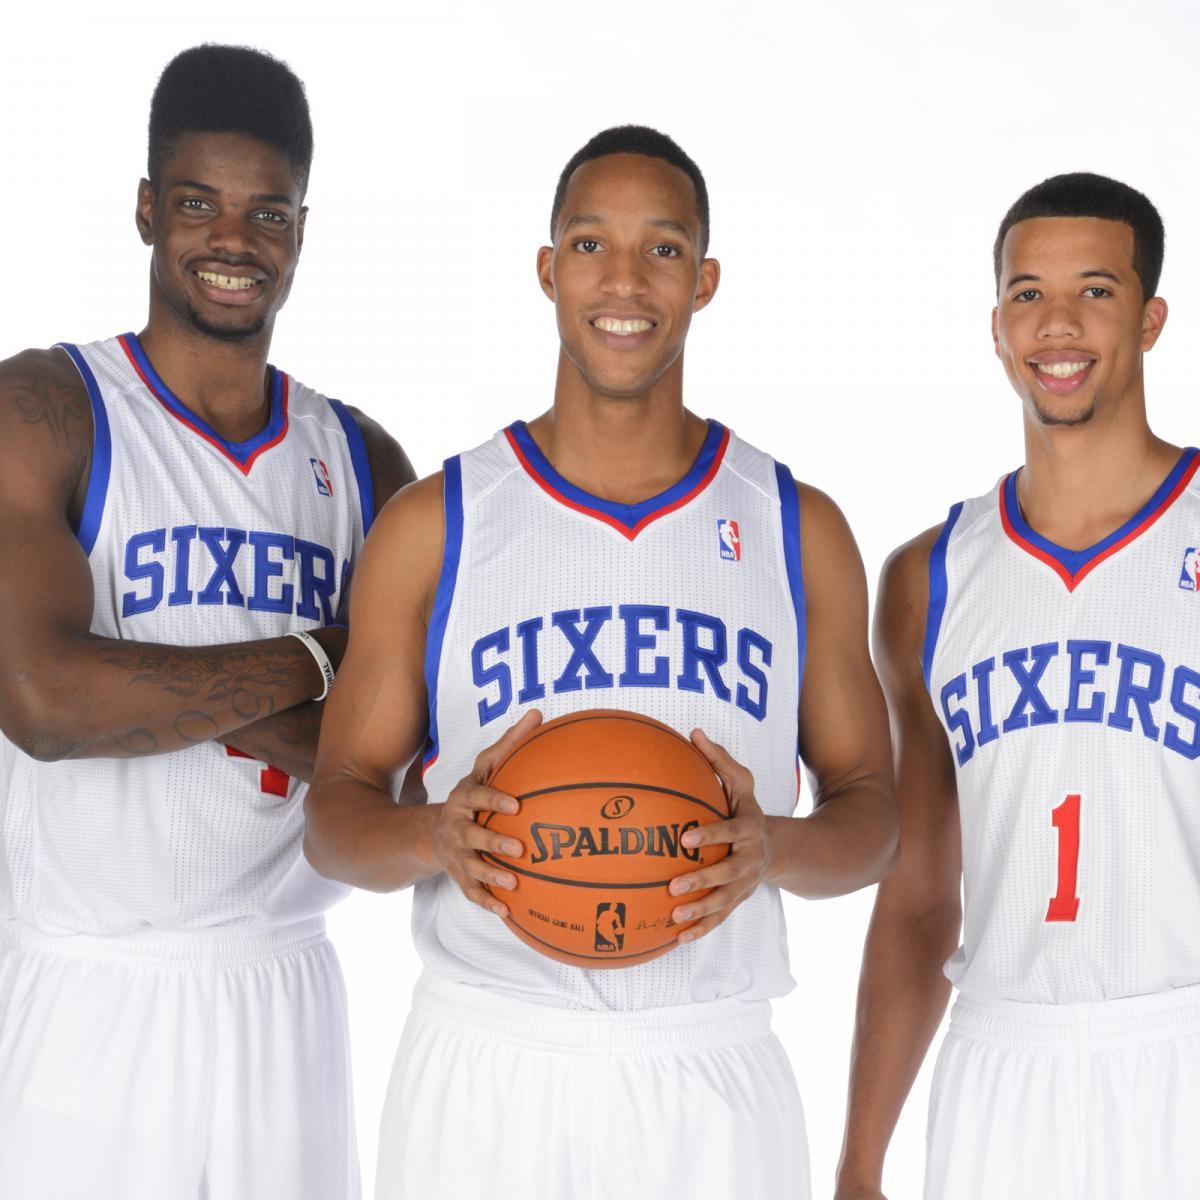 Blazer Team Roster 2013: Philadelphia 76ers Preview 2013-14: Lineup, Roster